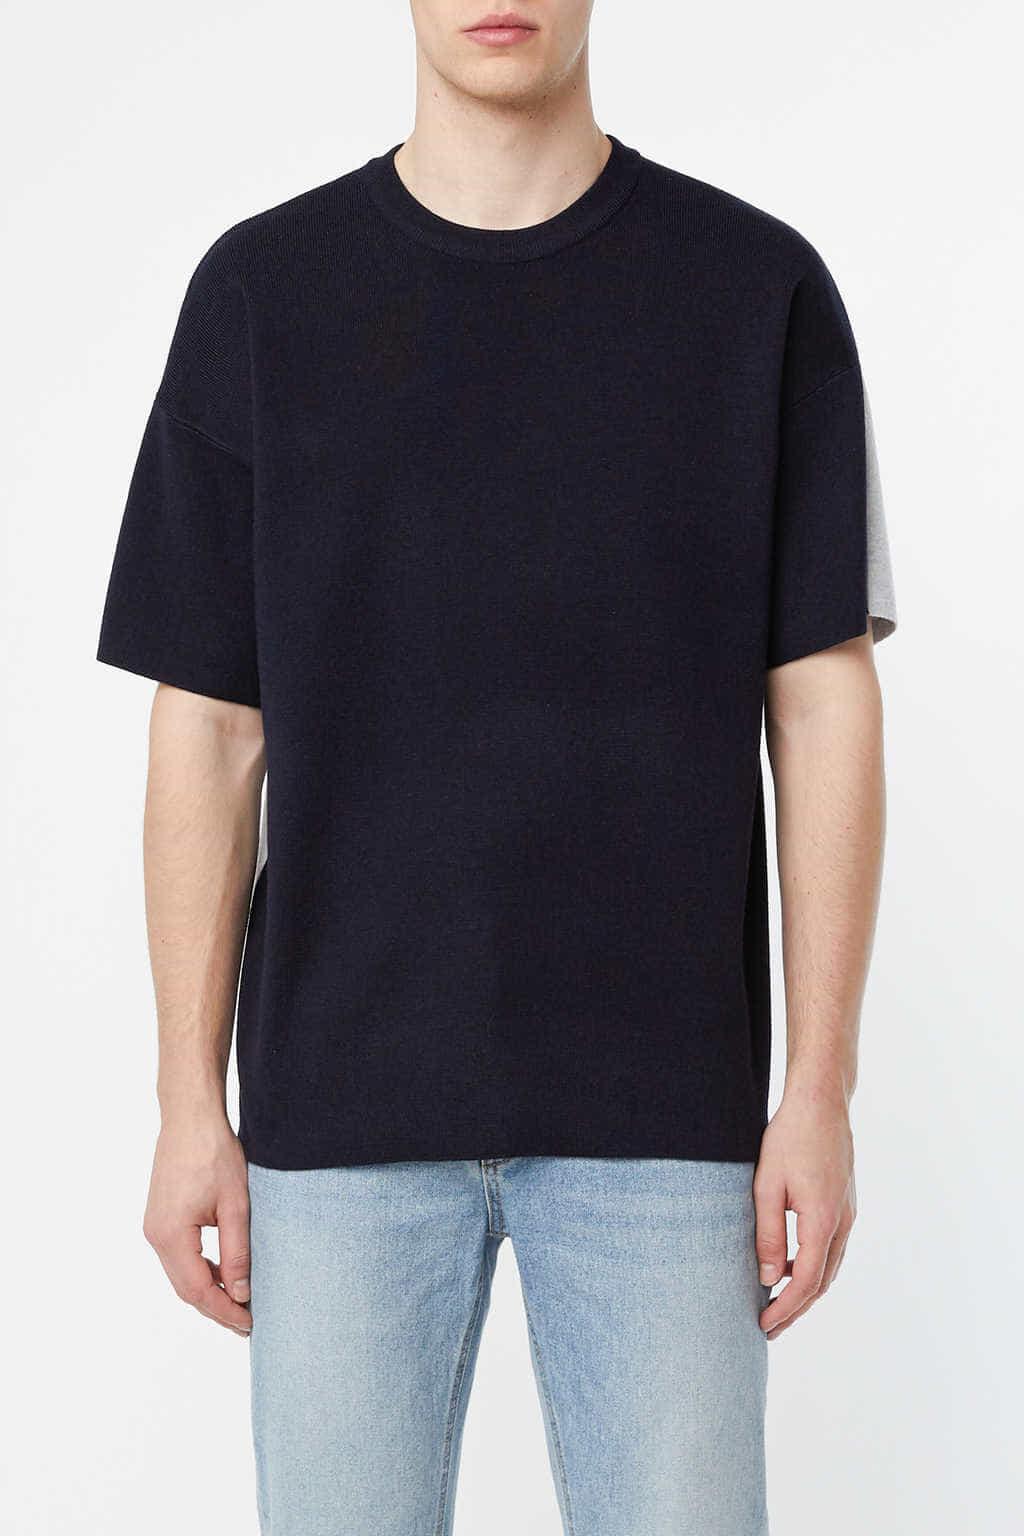 Sweater 3156 Navy 8